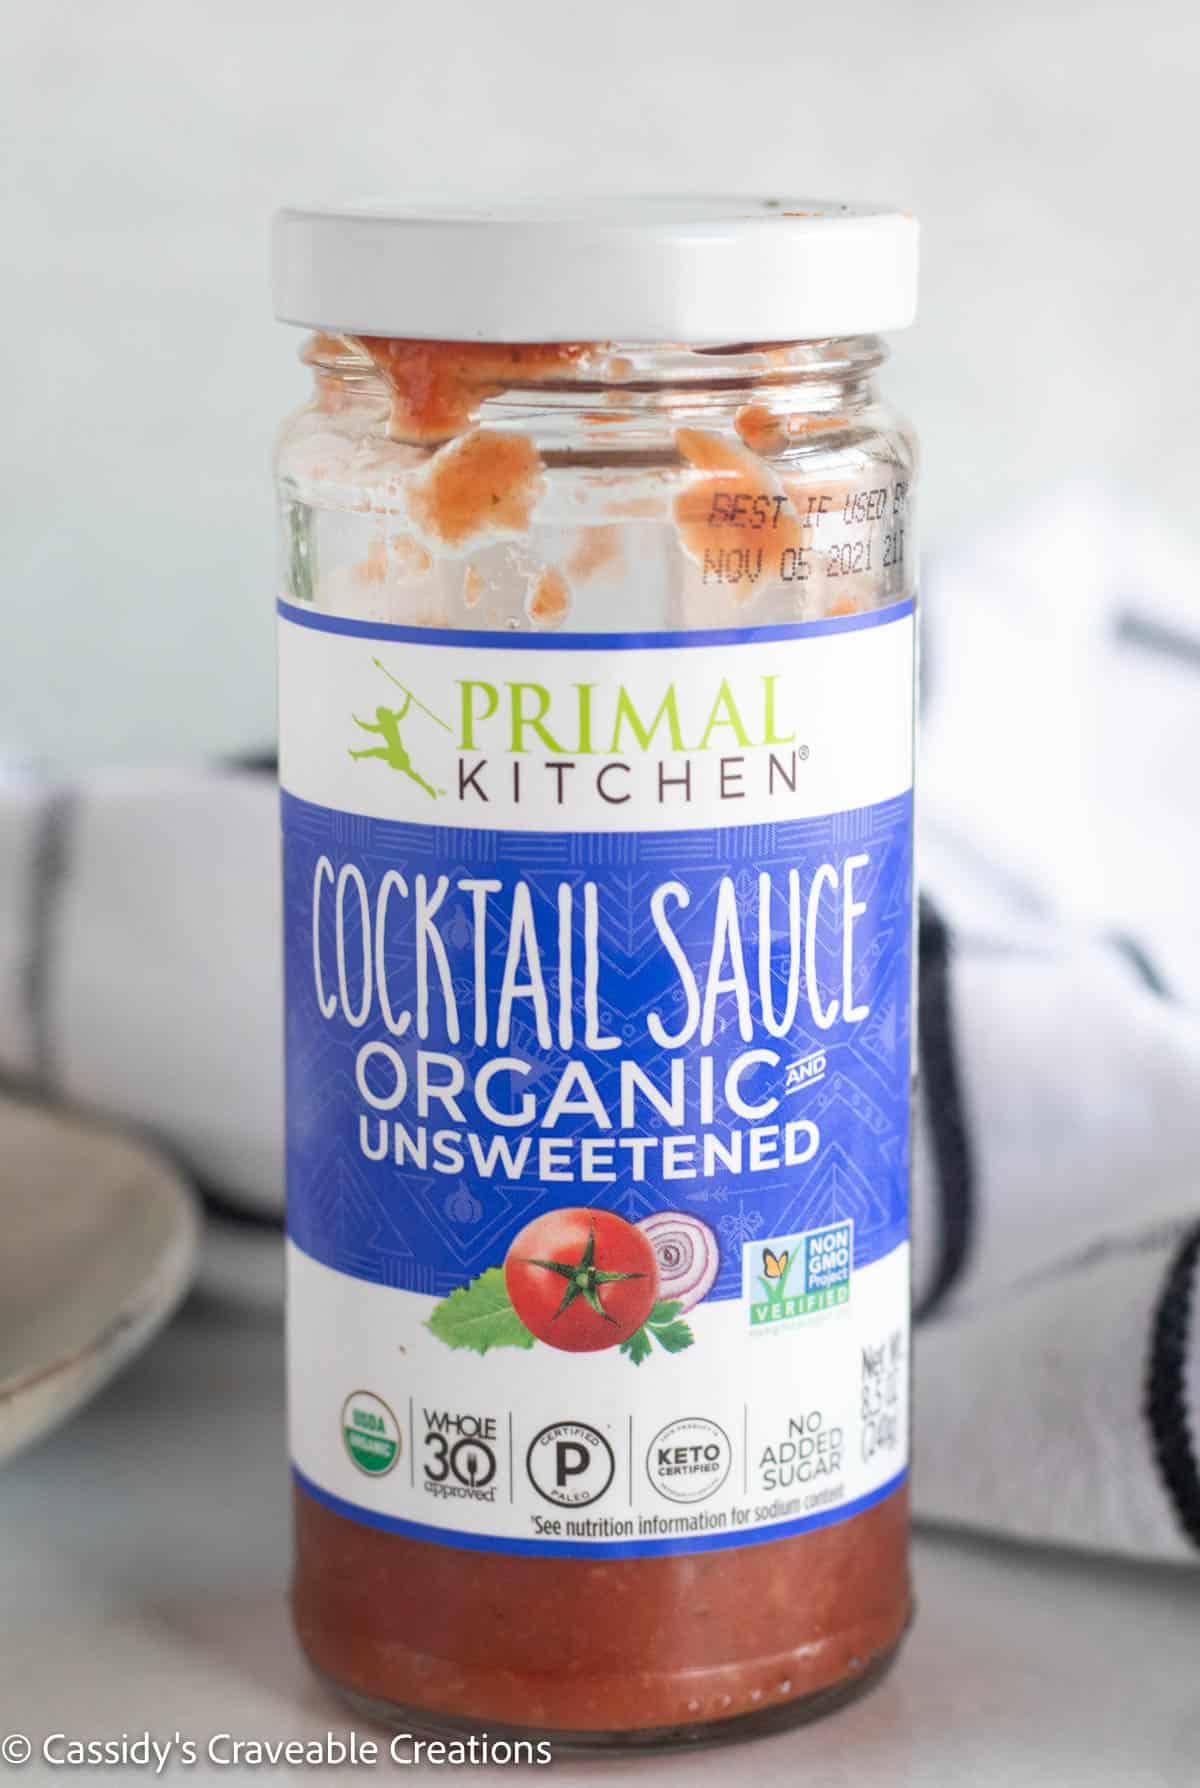 bottle of primal kitchen cocktail sauce